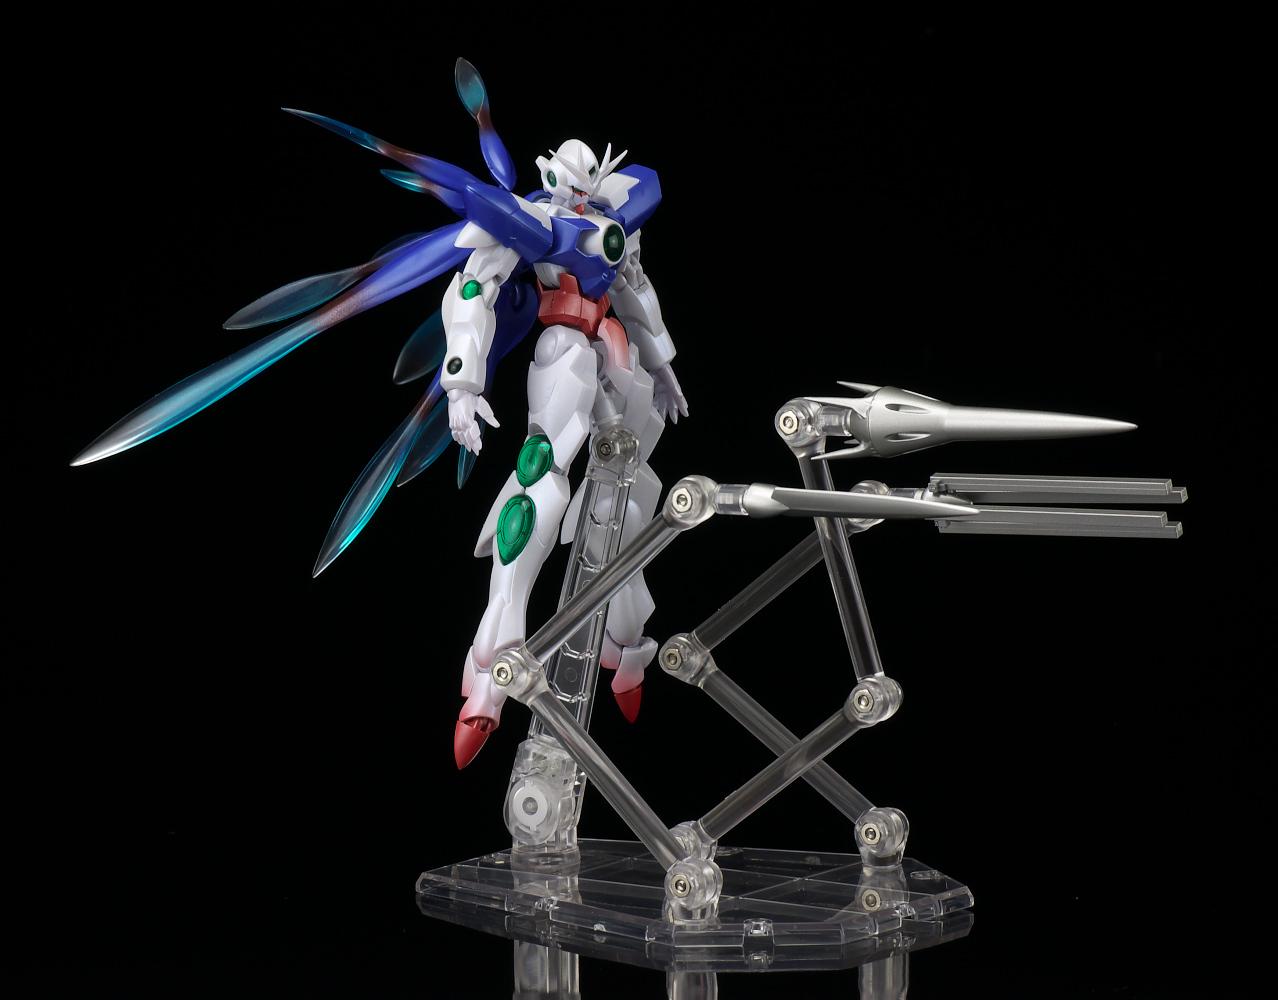 Robot Damashii (Side MS) ELS Qan[T]: Photoreview No.24 ...